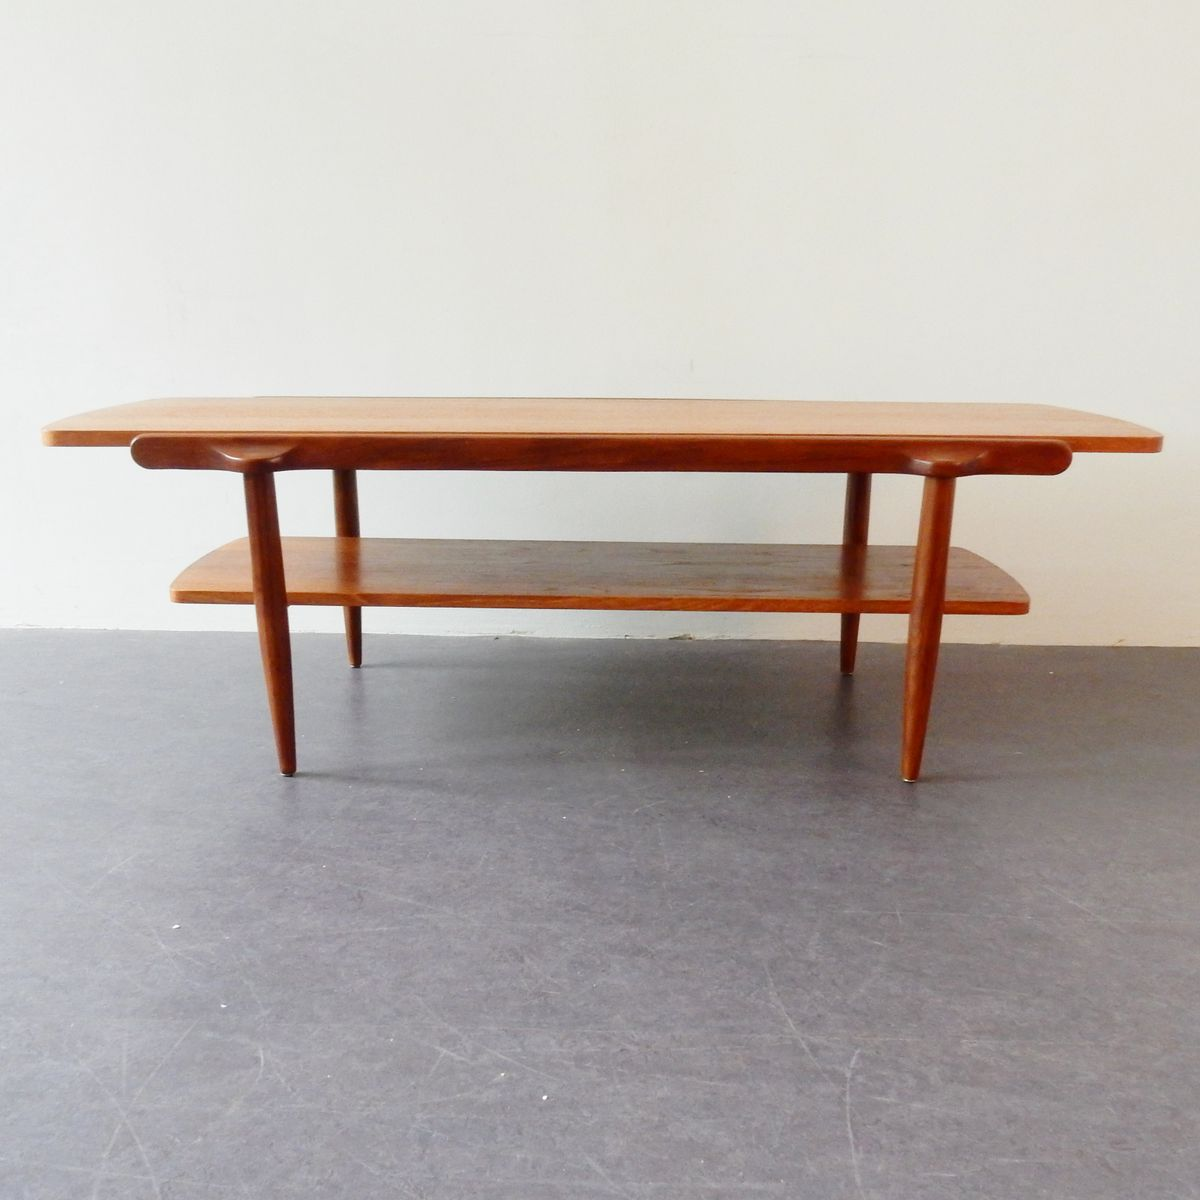 table basse avec dessus r versible 1960s en vente sur pamono. Black Bedroom Furniture Sets. Home Design Ideas